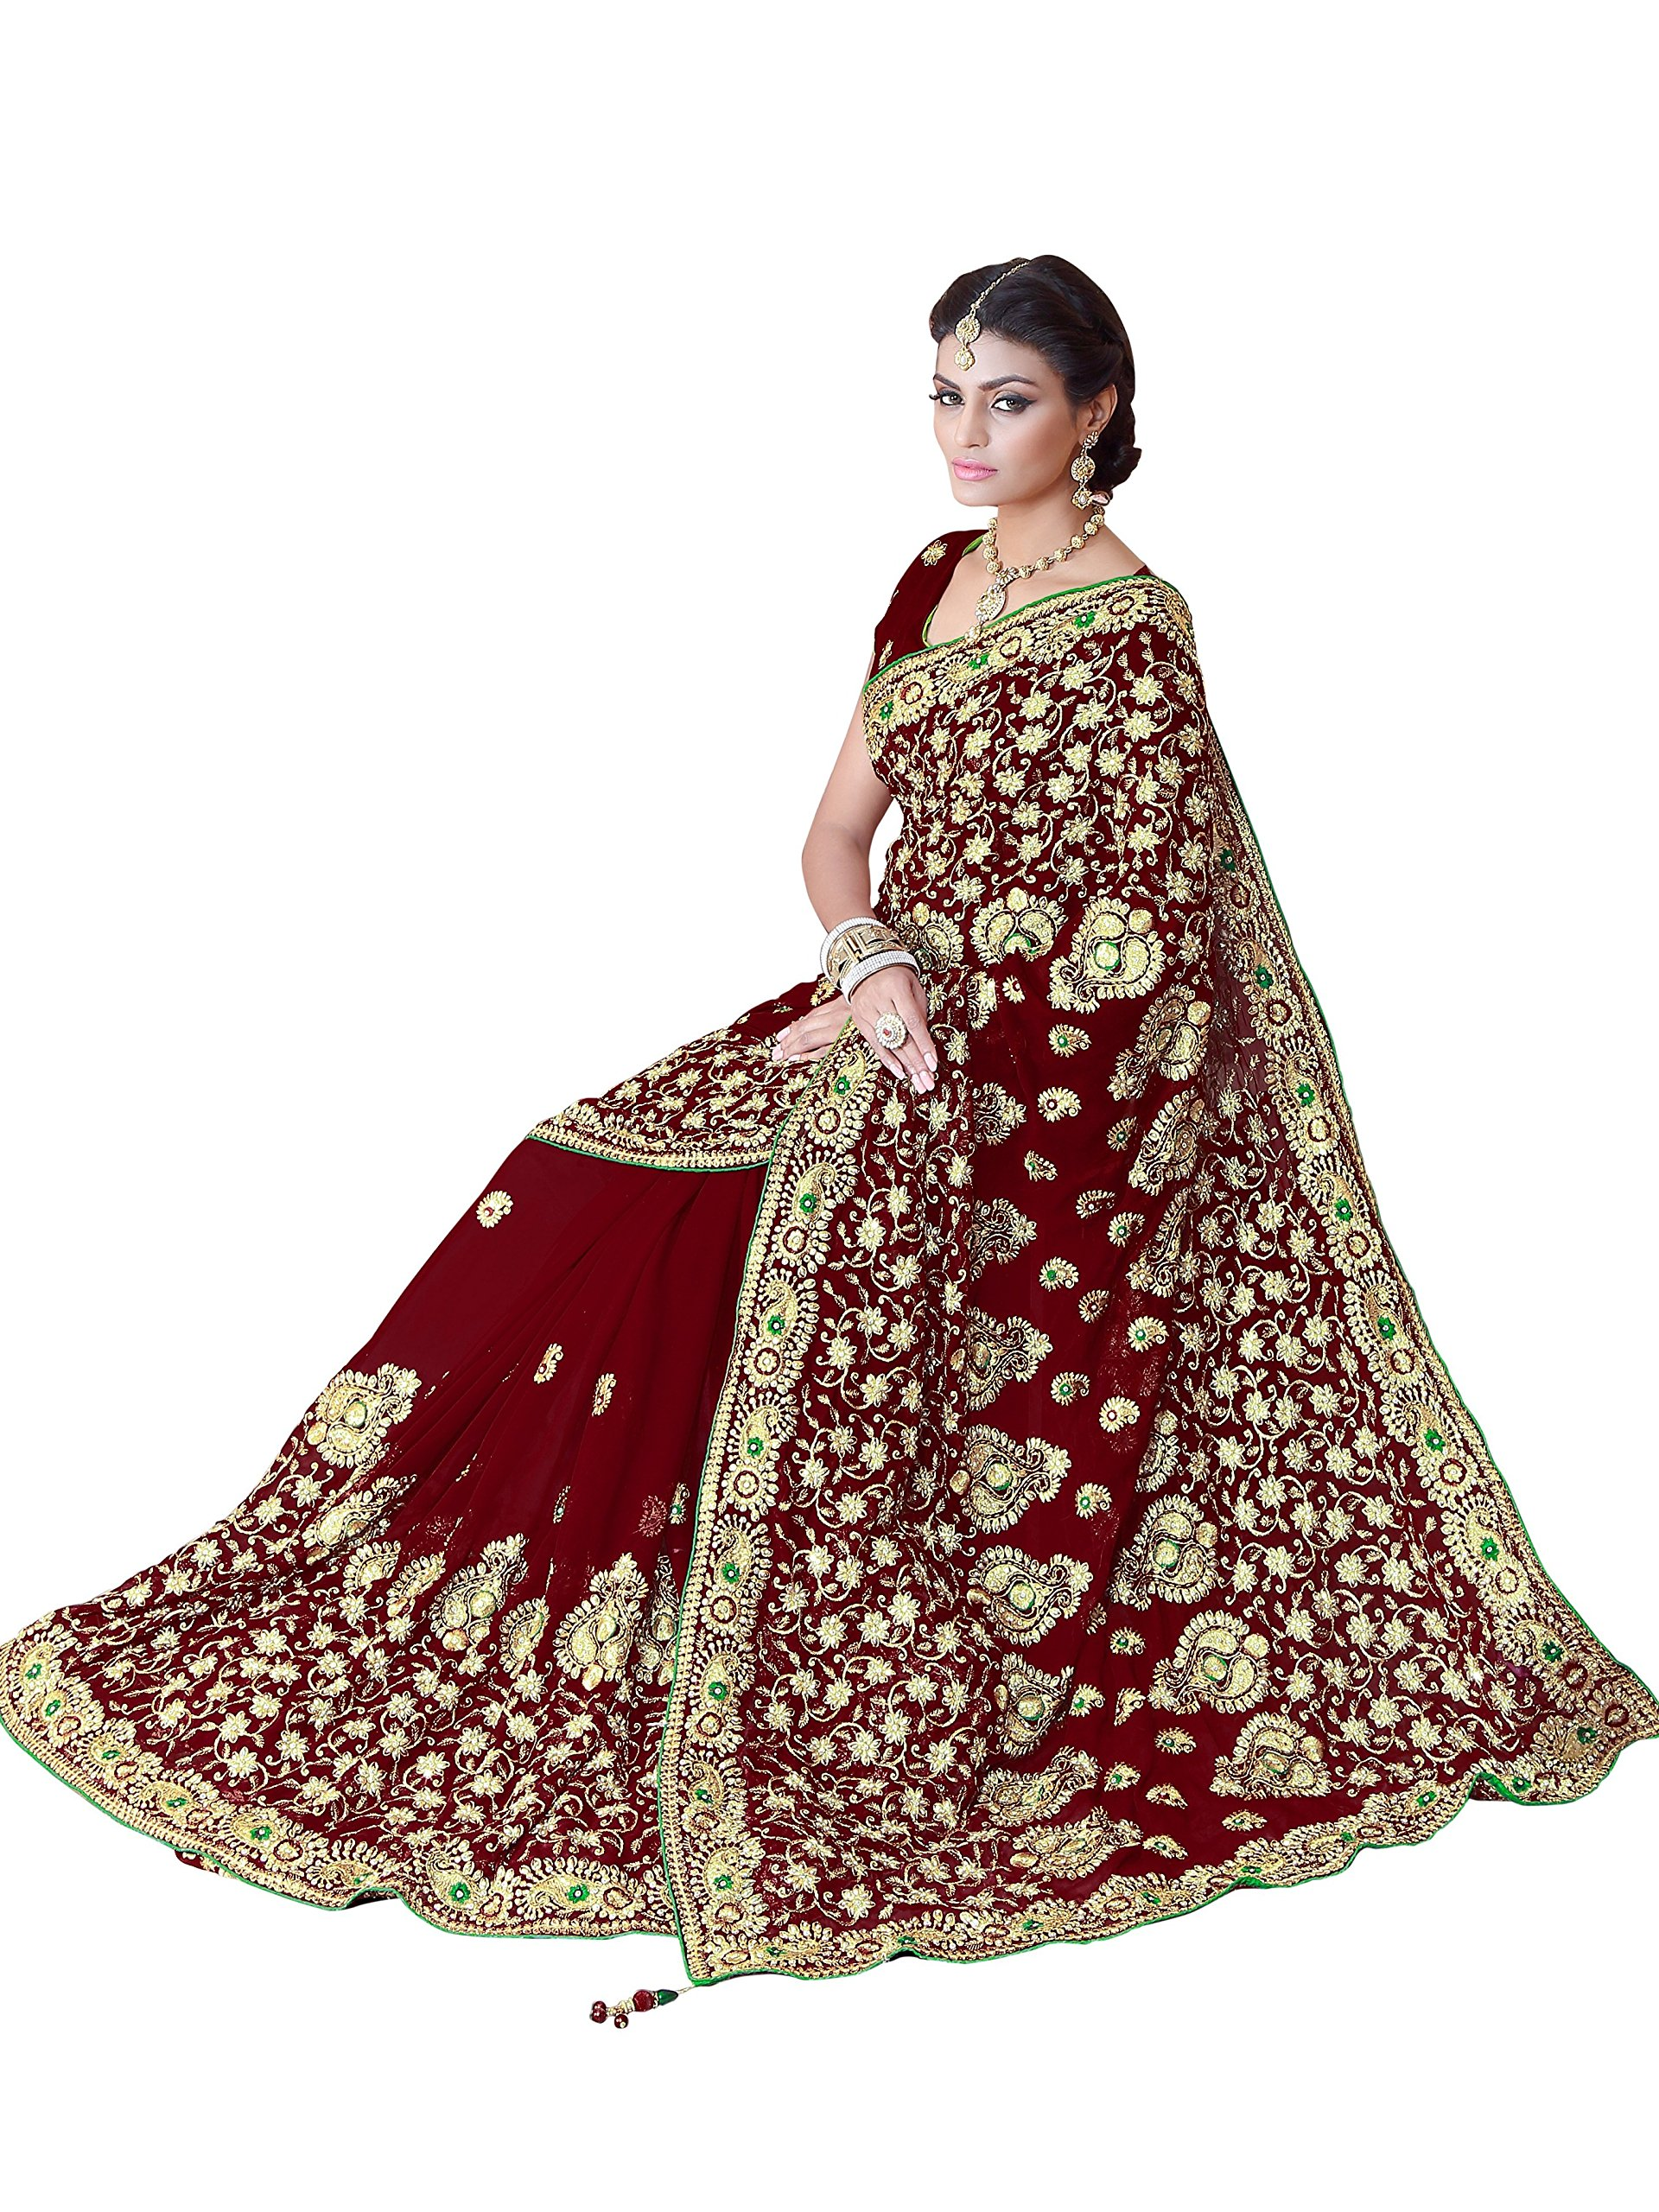 Mirchi Fashion Women's Heavy Embroidery Bridal/Wedding Wear Saree (2386_Maroon)